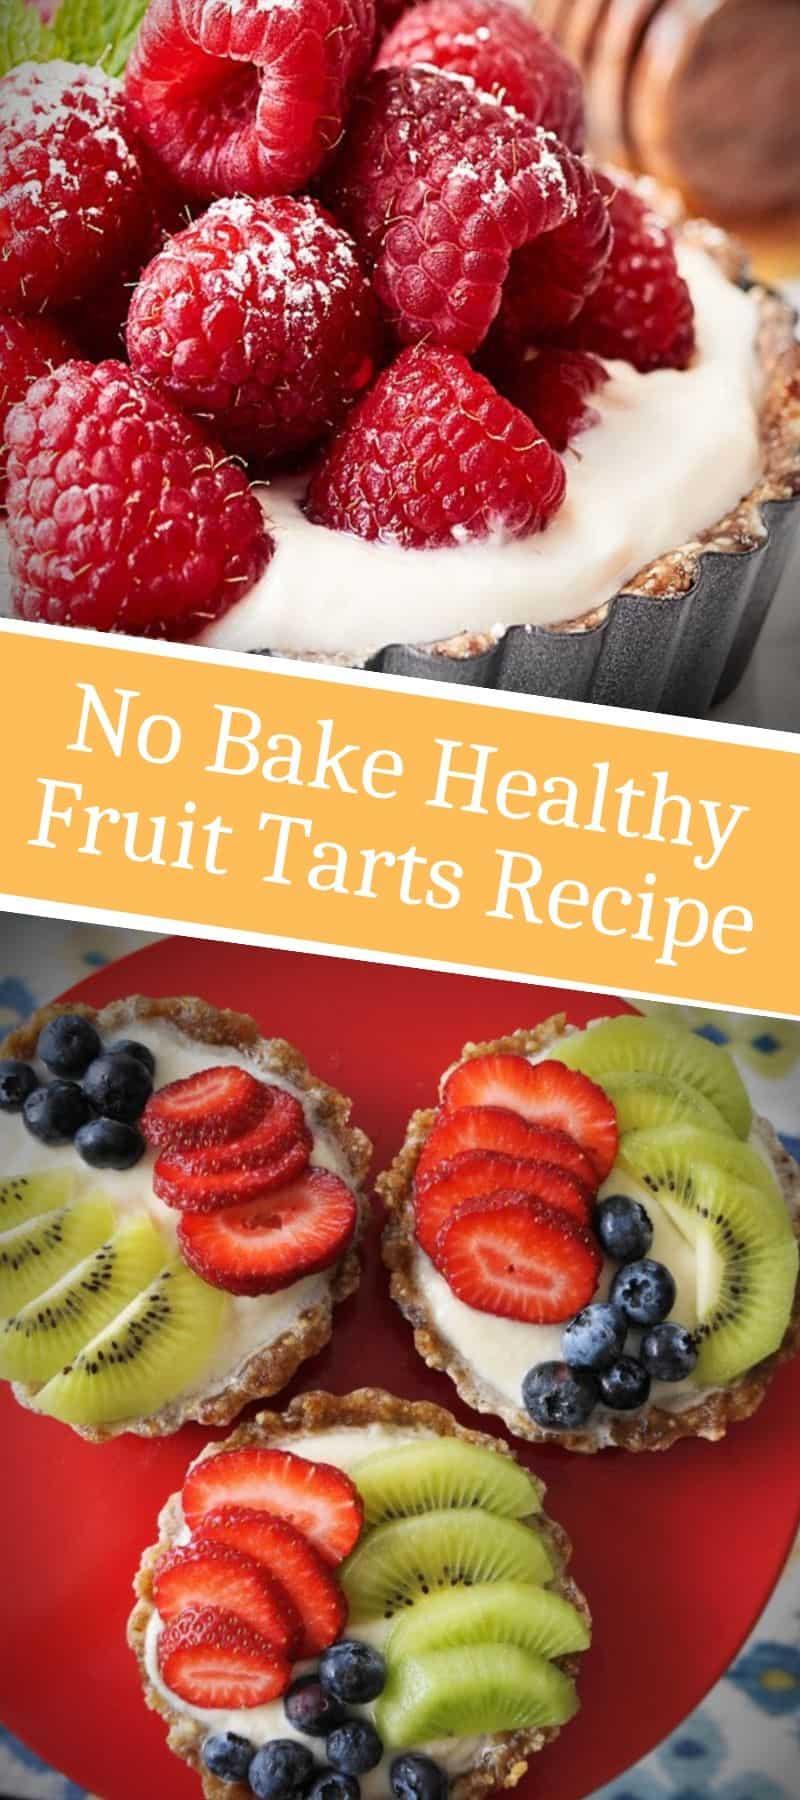 No Bake Healthy Fruit Tarts Recipe 3